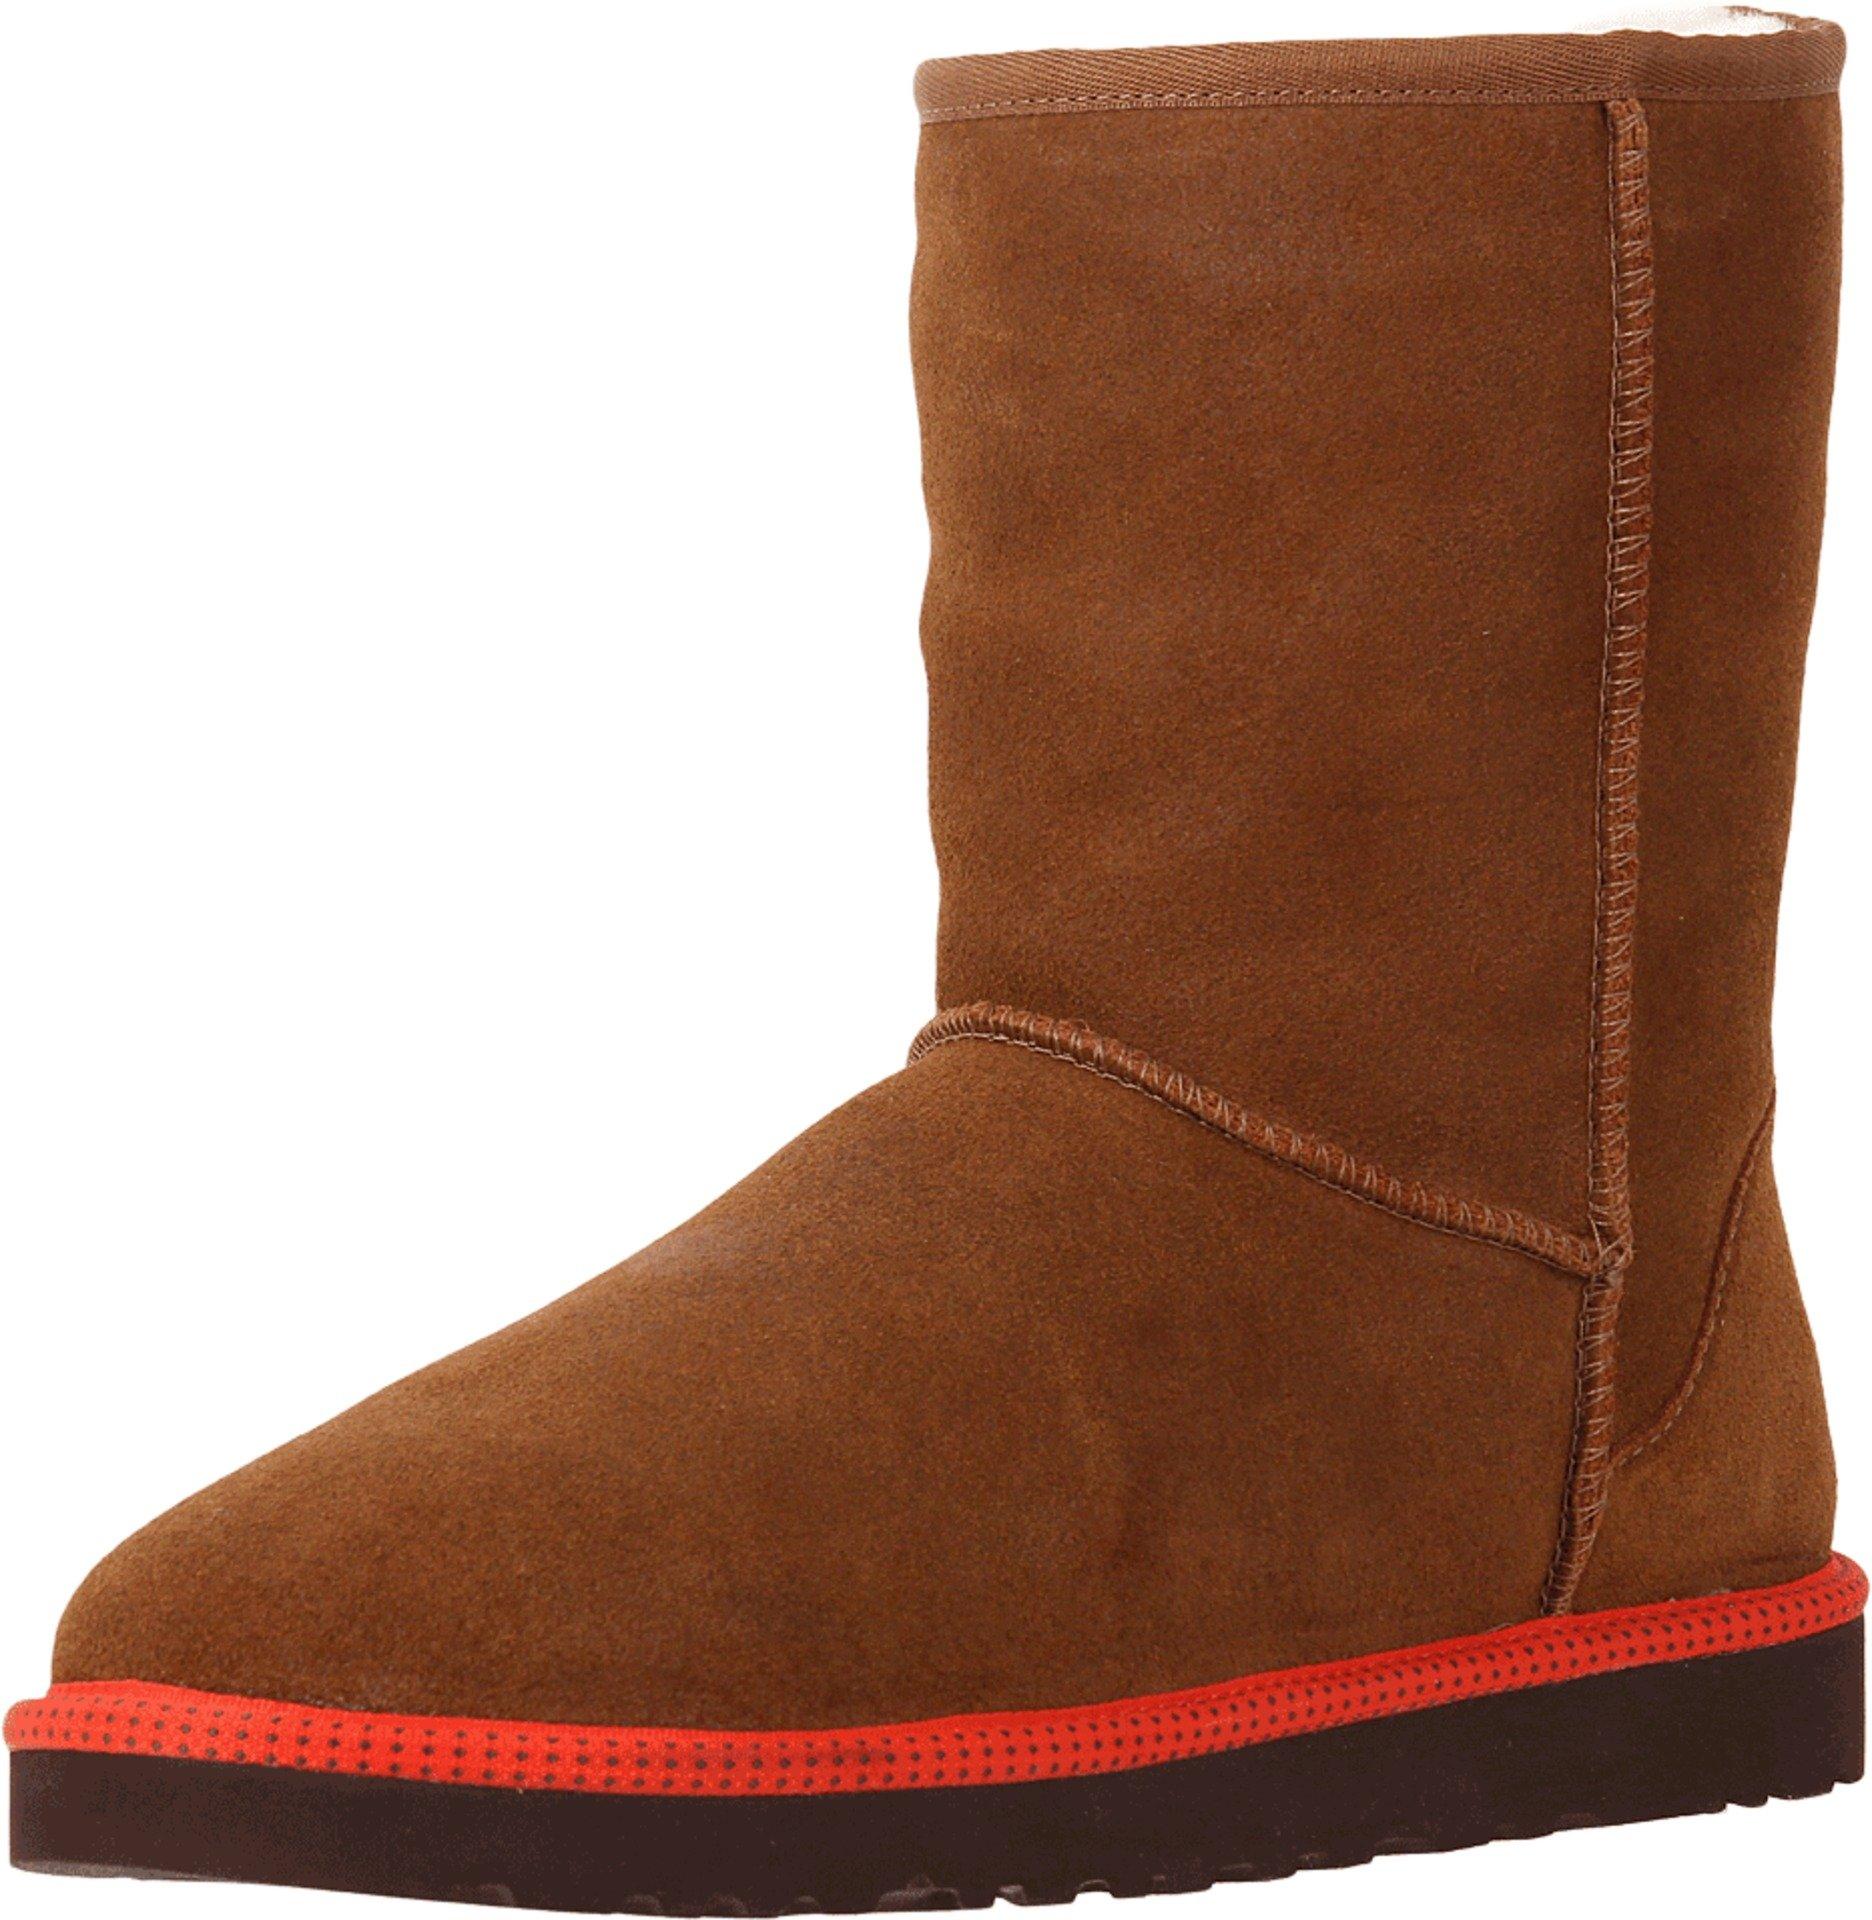 UGG Men's Classic Short Leather Chestnut Leather/Sheepskin Boot 18 D - Medium